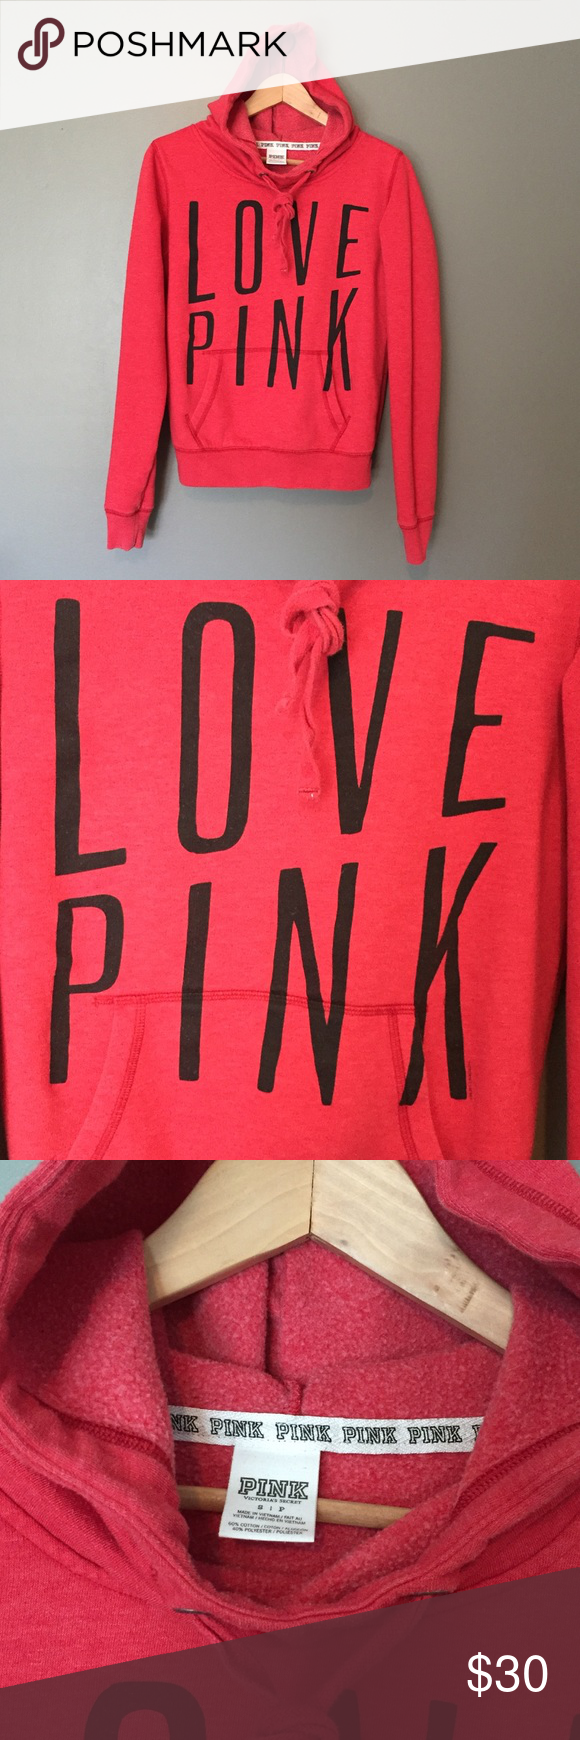 PINK VS hoodie sweatshirt | Pullover, Conditioning and Sweatshirt